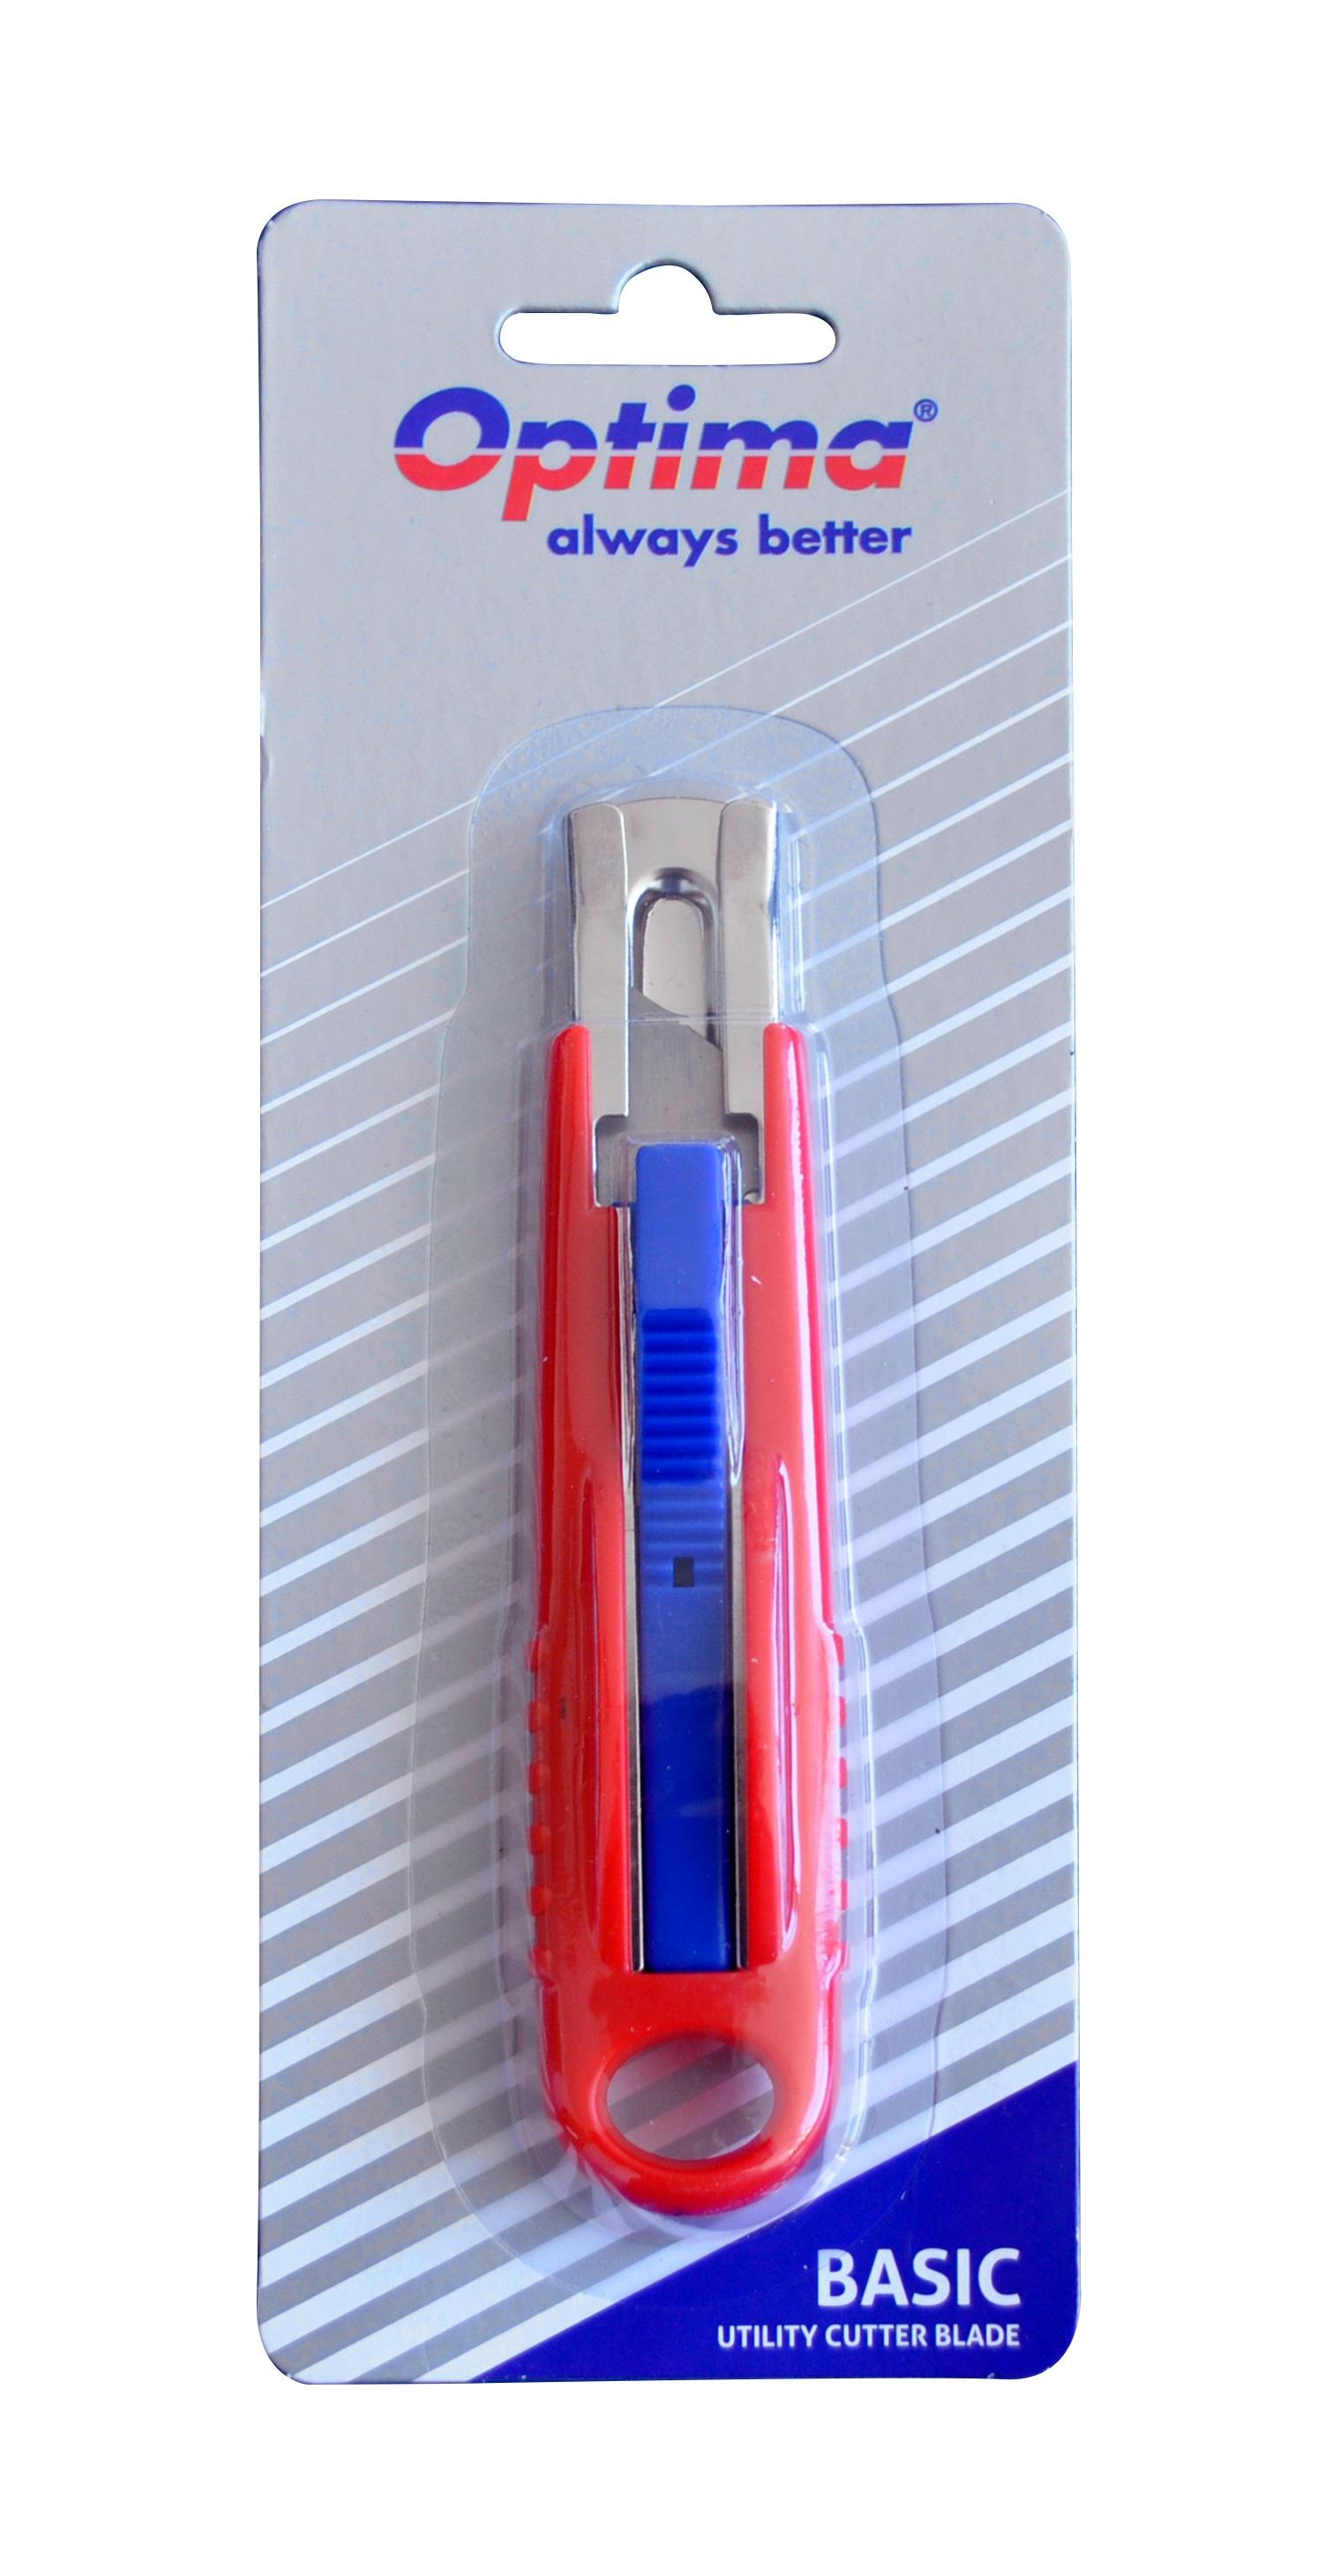 Cutter basic Optima, lama trapezoidala SK5, auto-retractabil, sina metalica, ABS